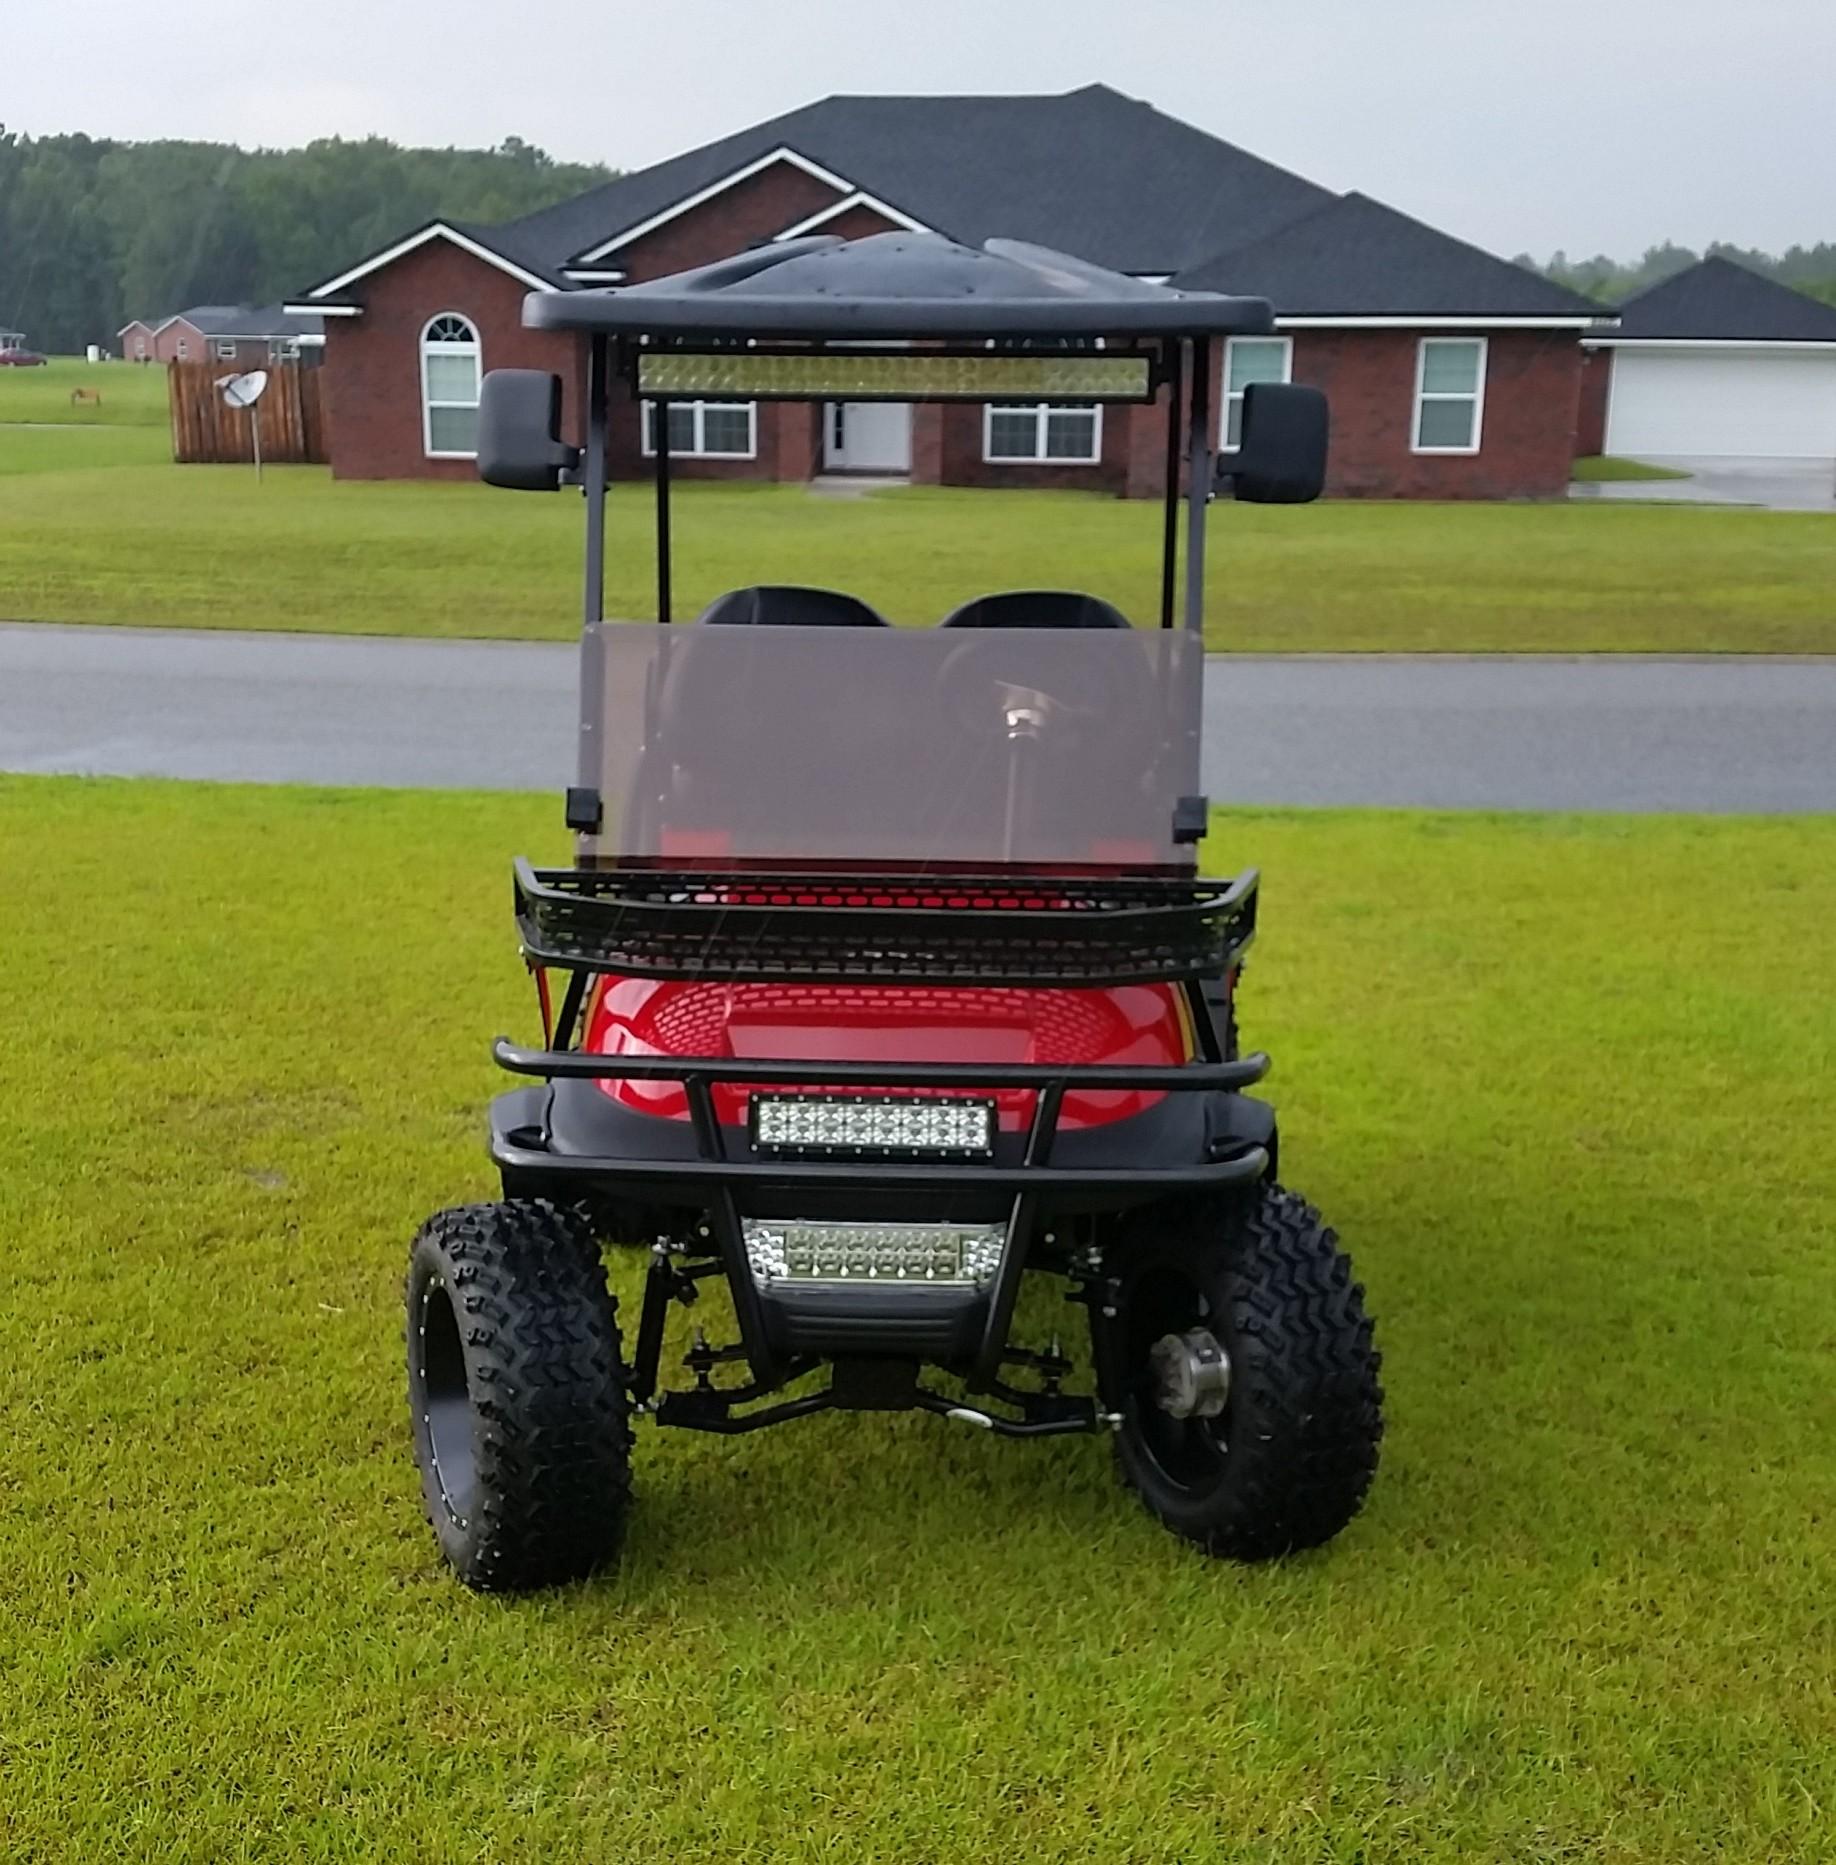 How to Tese forward Reverse Switch Club Car Cart Golf Cart Electric Motors High Speed Performance & Upgrade Of How to Tese forward Reverse Switch Club Car Cart